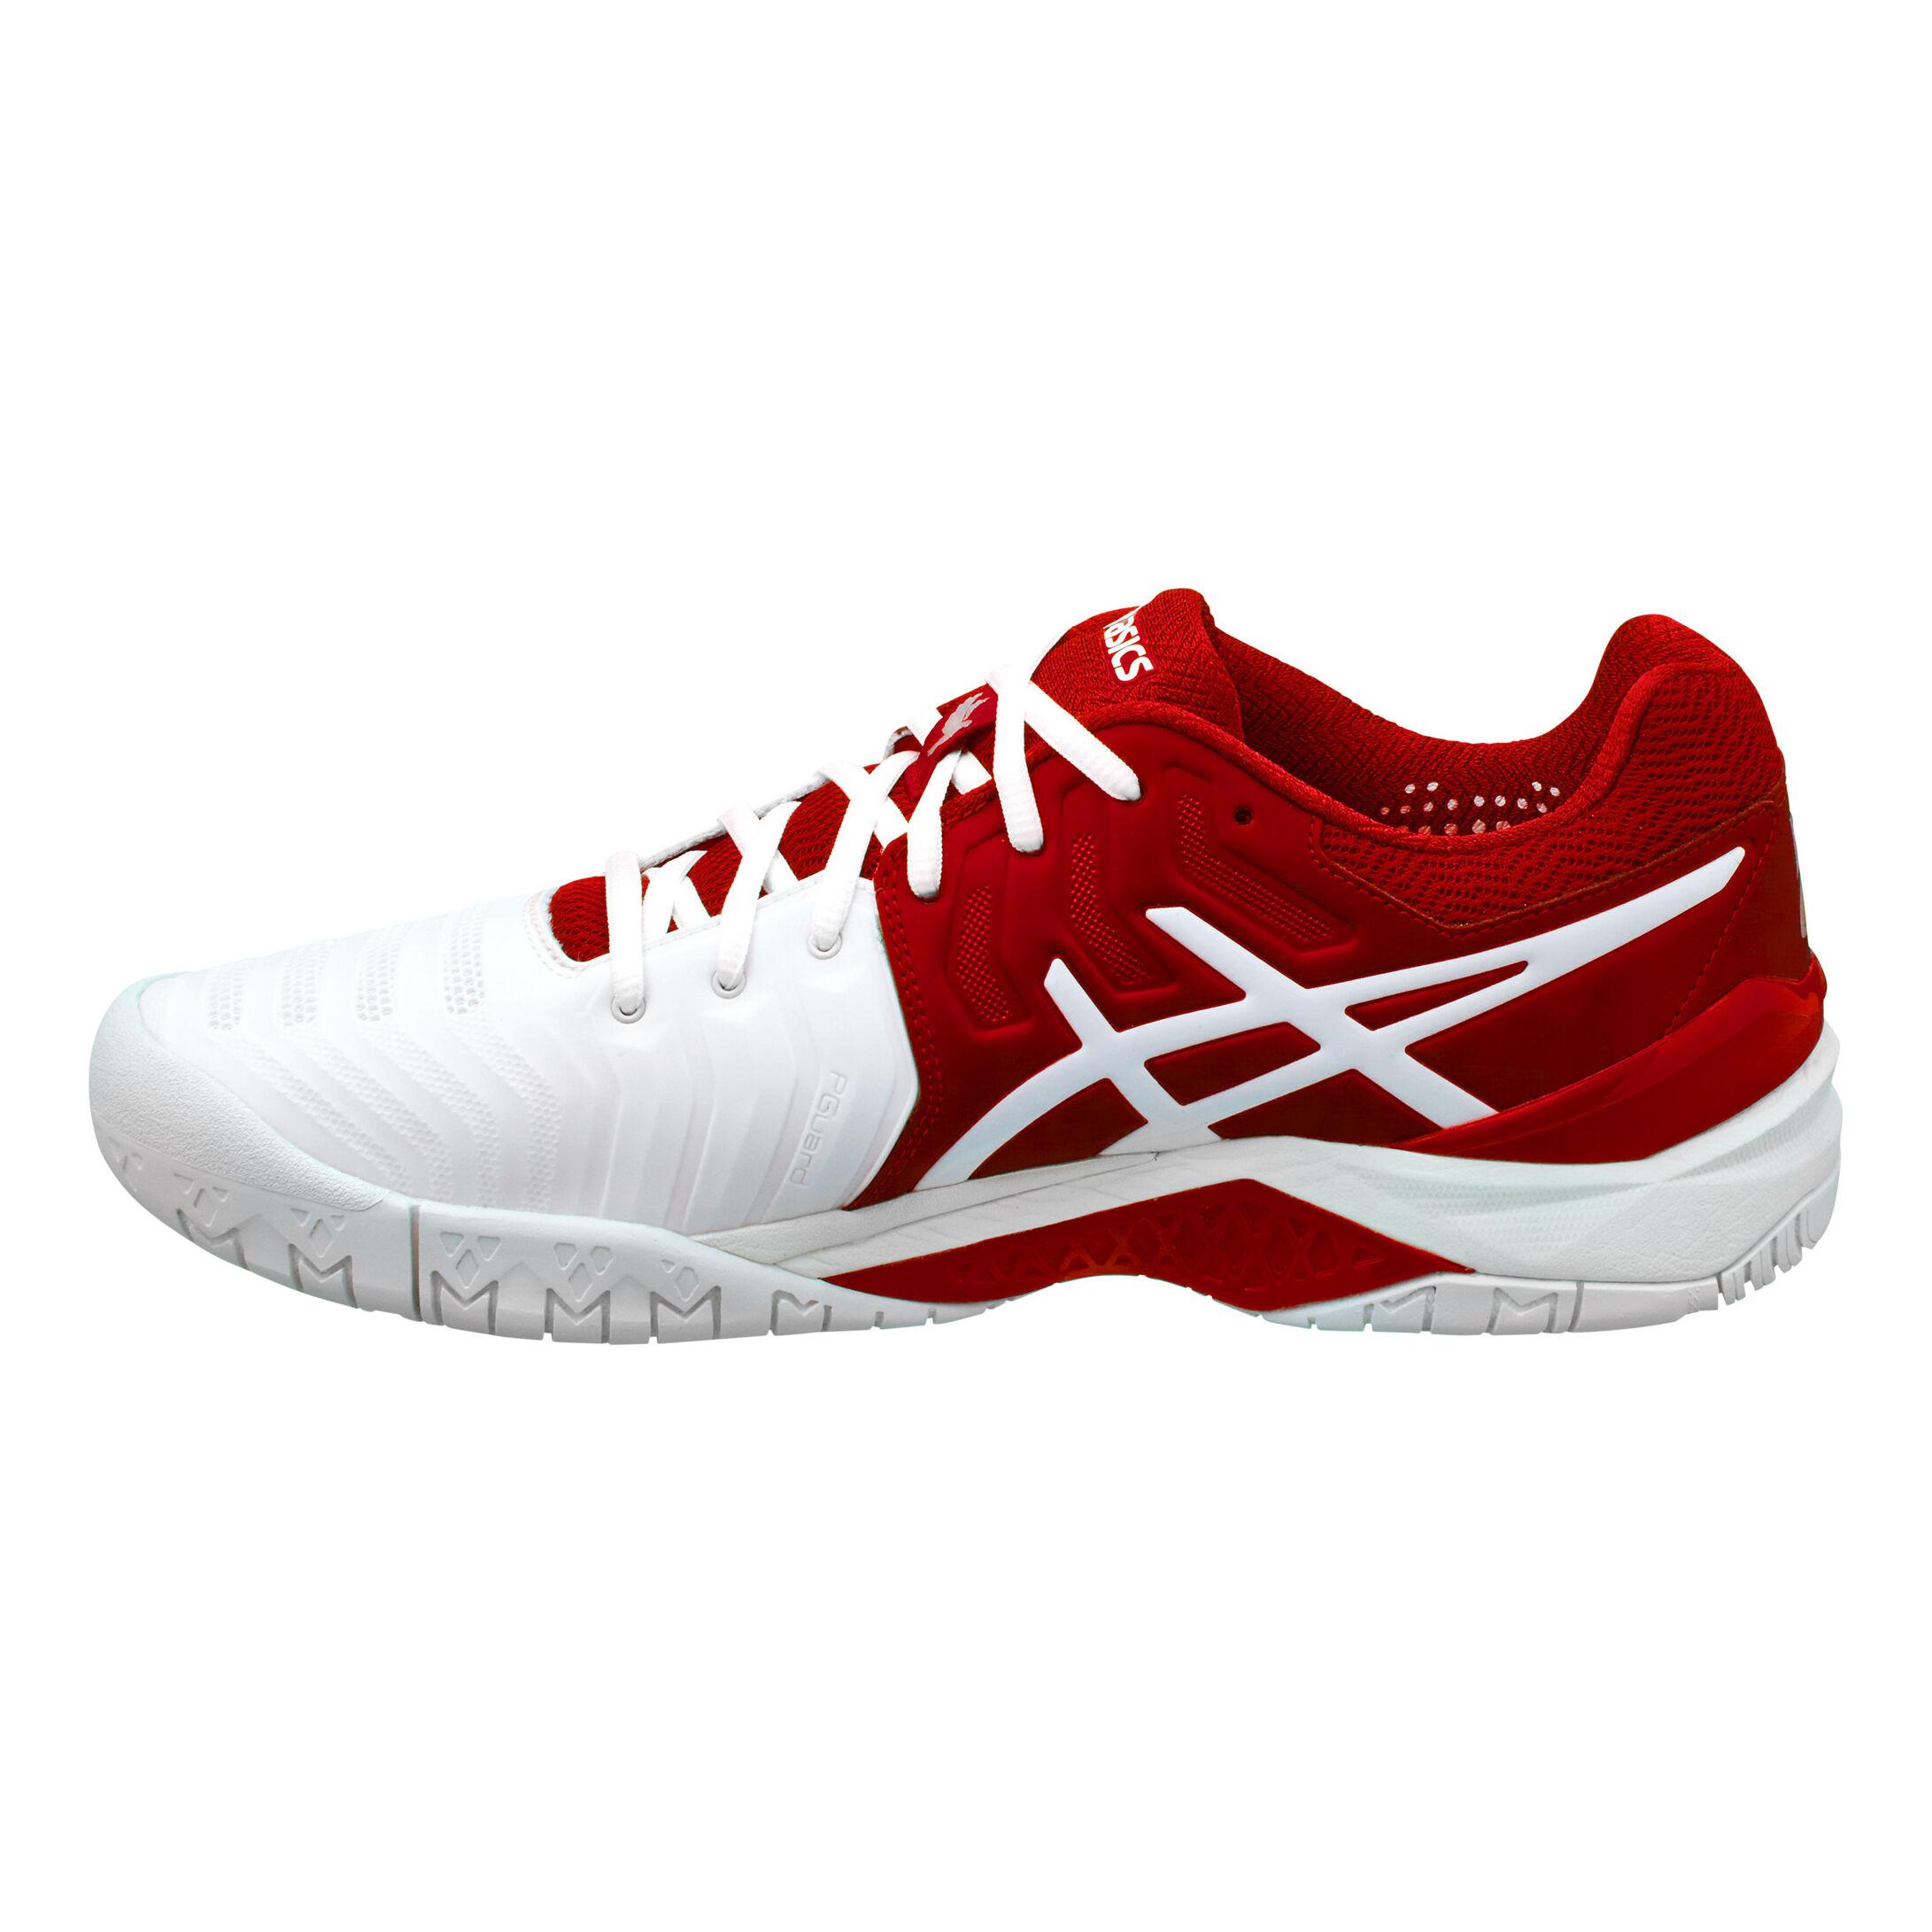 Asics Resolution Hommes Gel Novak Chaussure Tout Terrain Djokovic nN80wOkPX